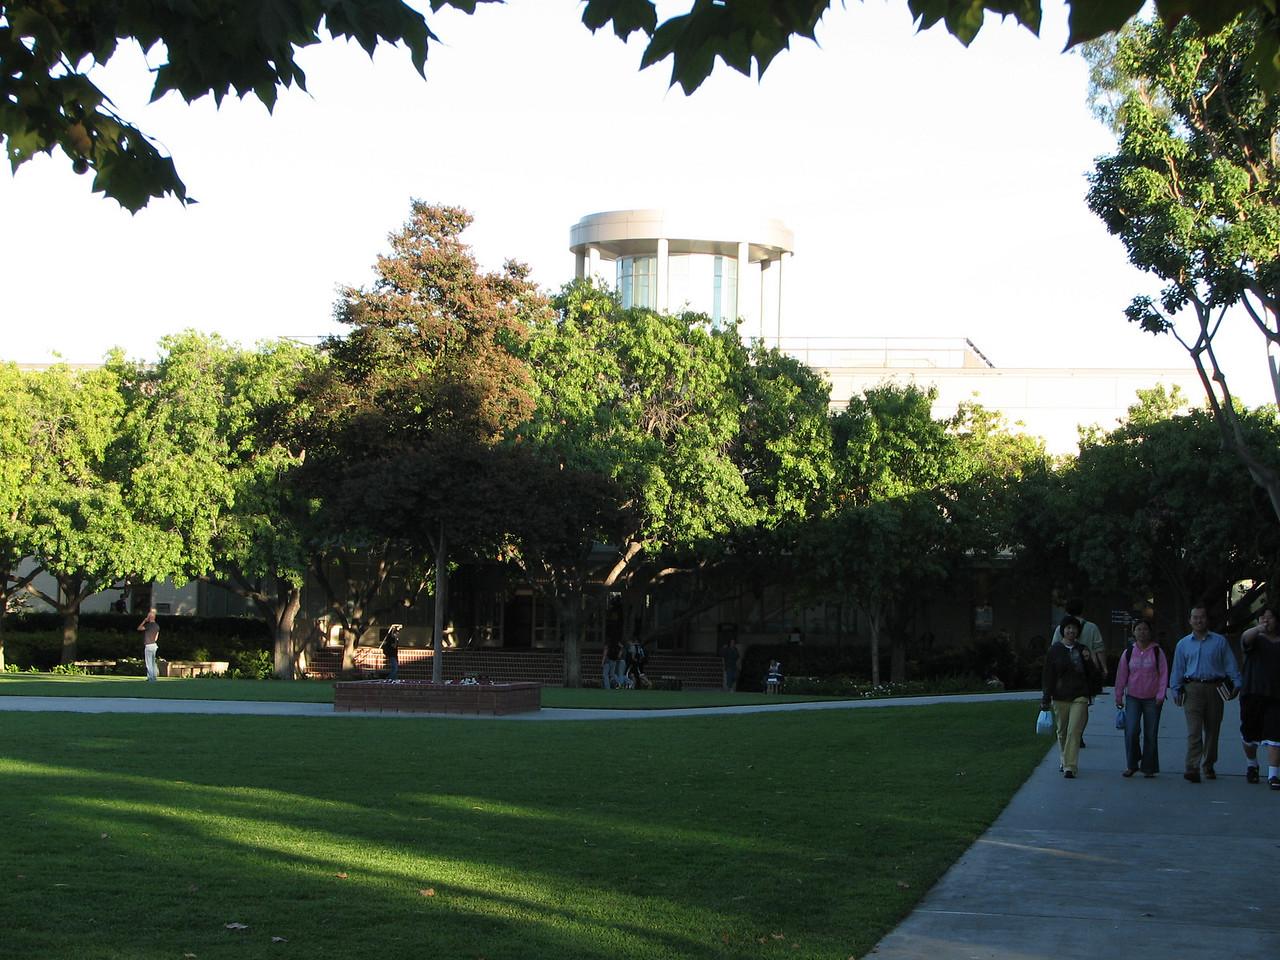 2006 09 27 Wed - Biola University Library is somewhere behind those trees 2